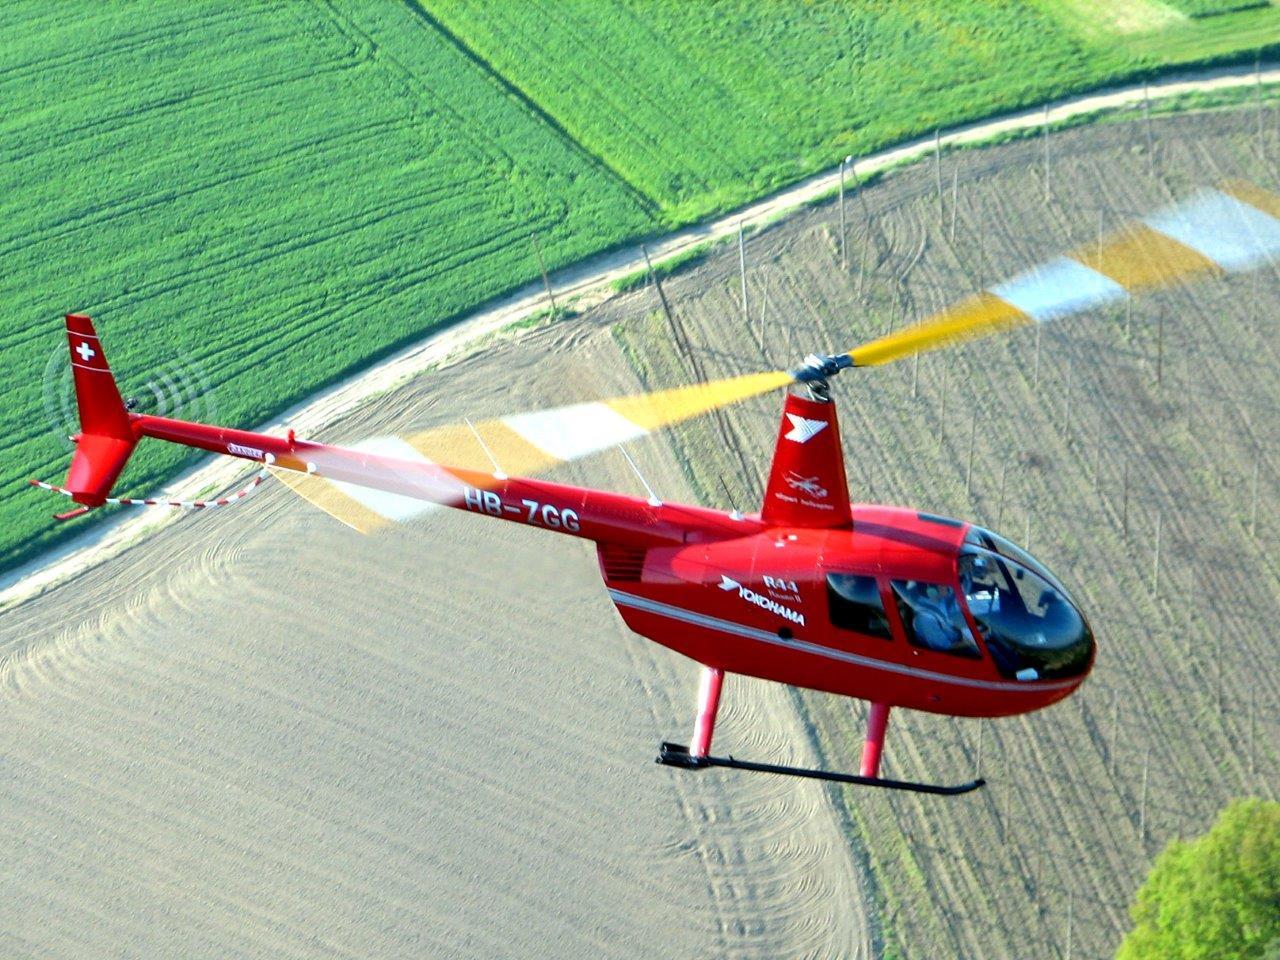 Hubschrauberflug Kassel Flugplatz